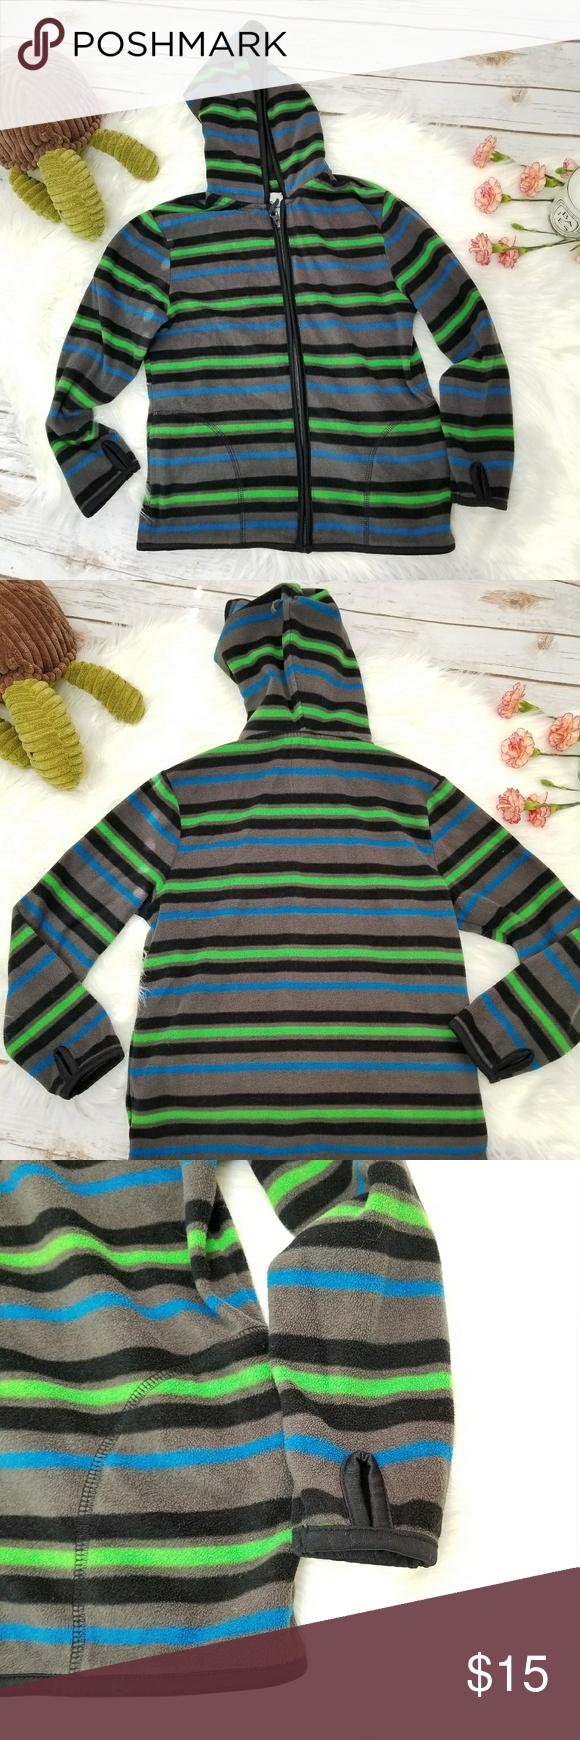 Kids Slalom Fleece Jacket Fleece jacket, Clothes design